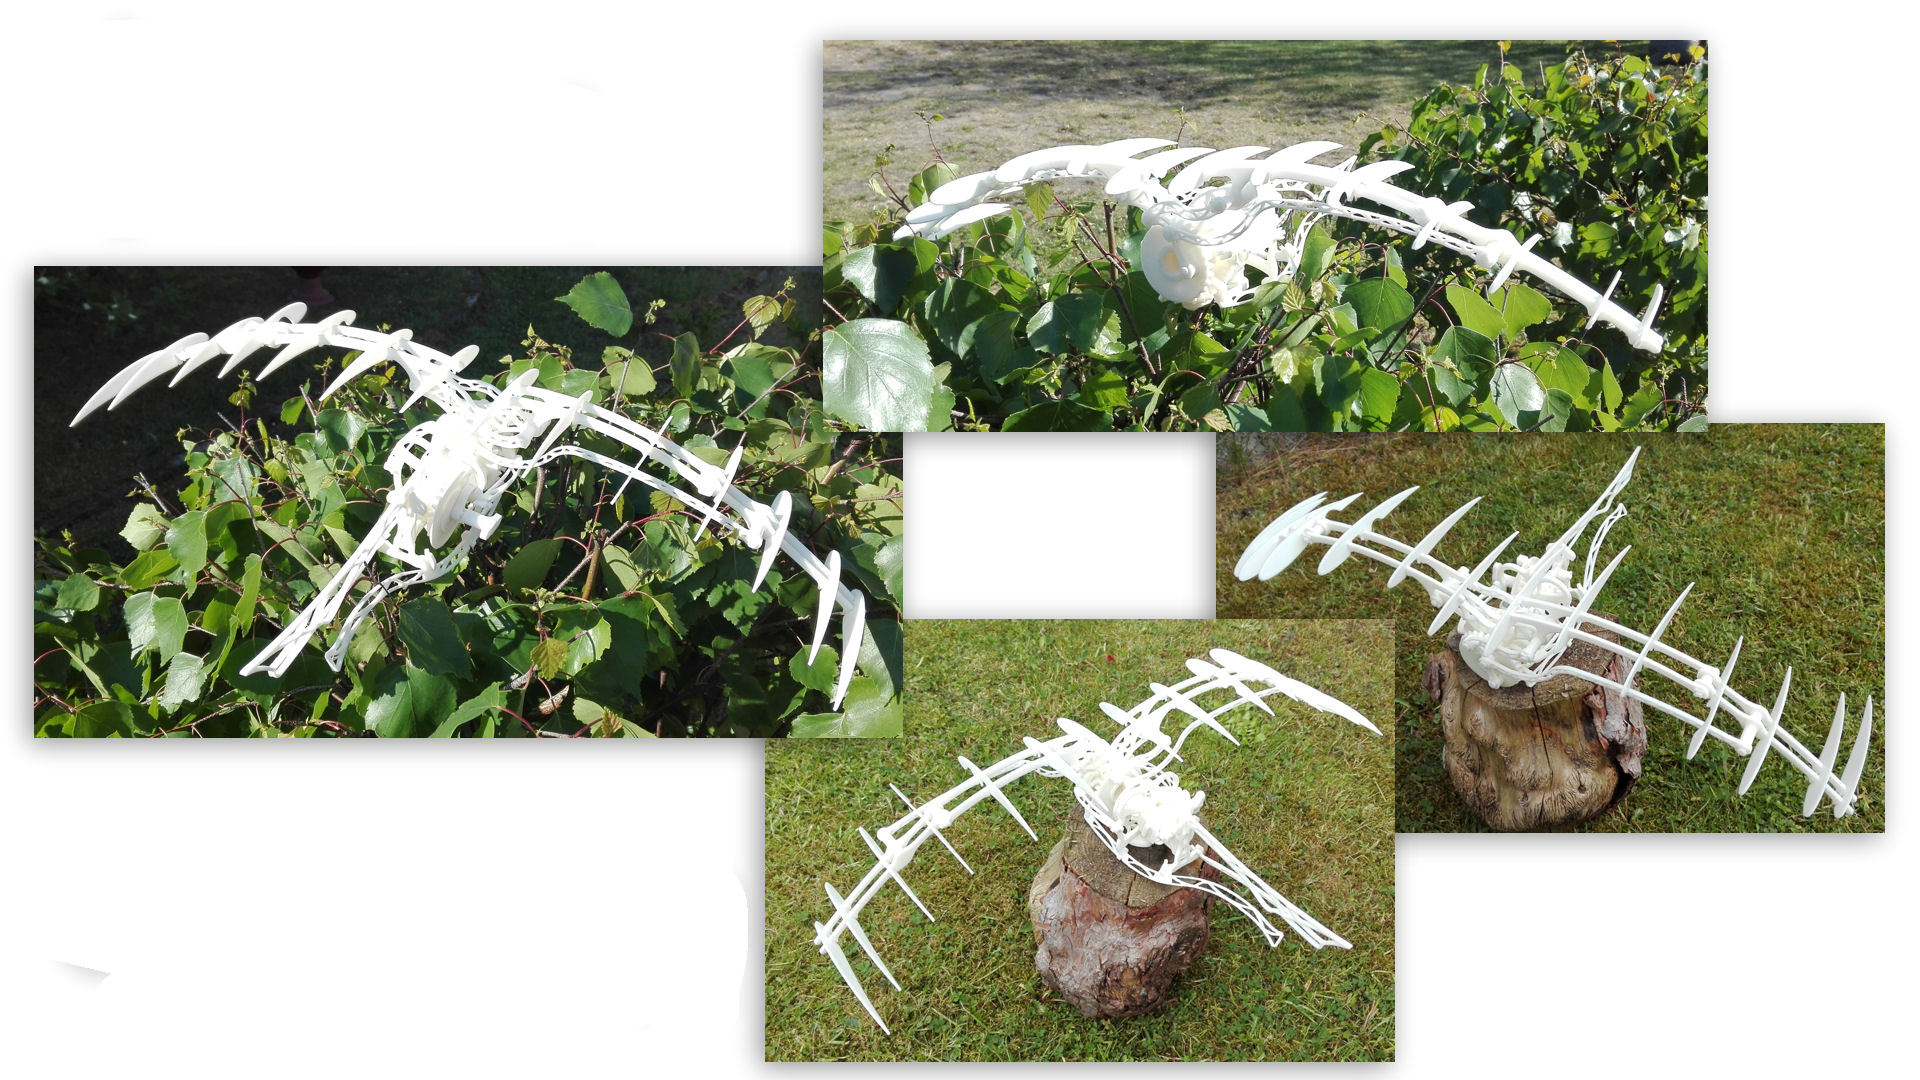 ornithopter仿达芬奇飞鸟机构扑翼机3D图纸 STEP x_t STL格式